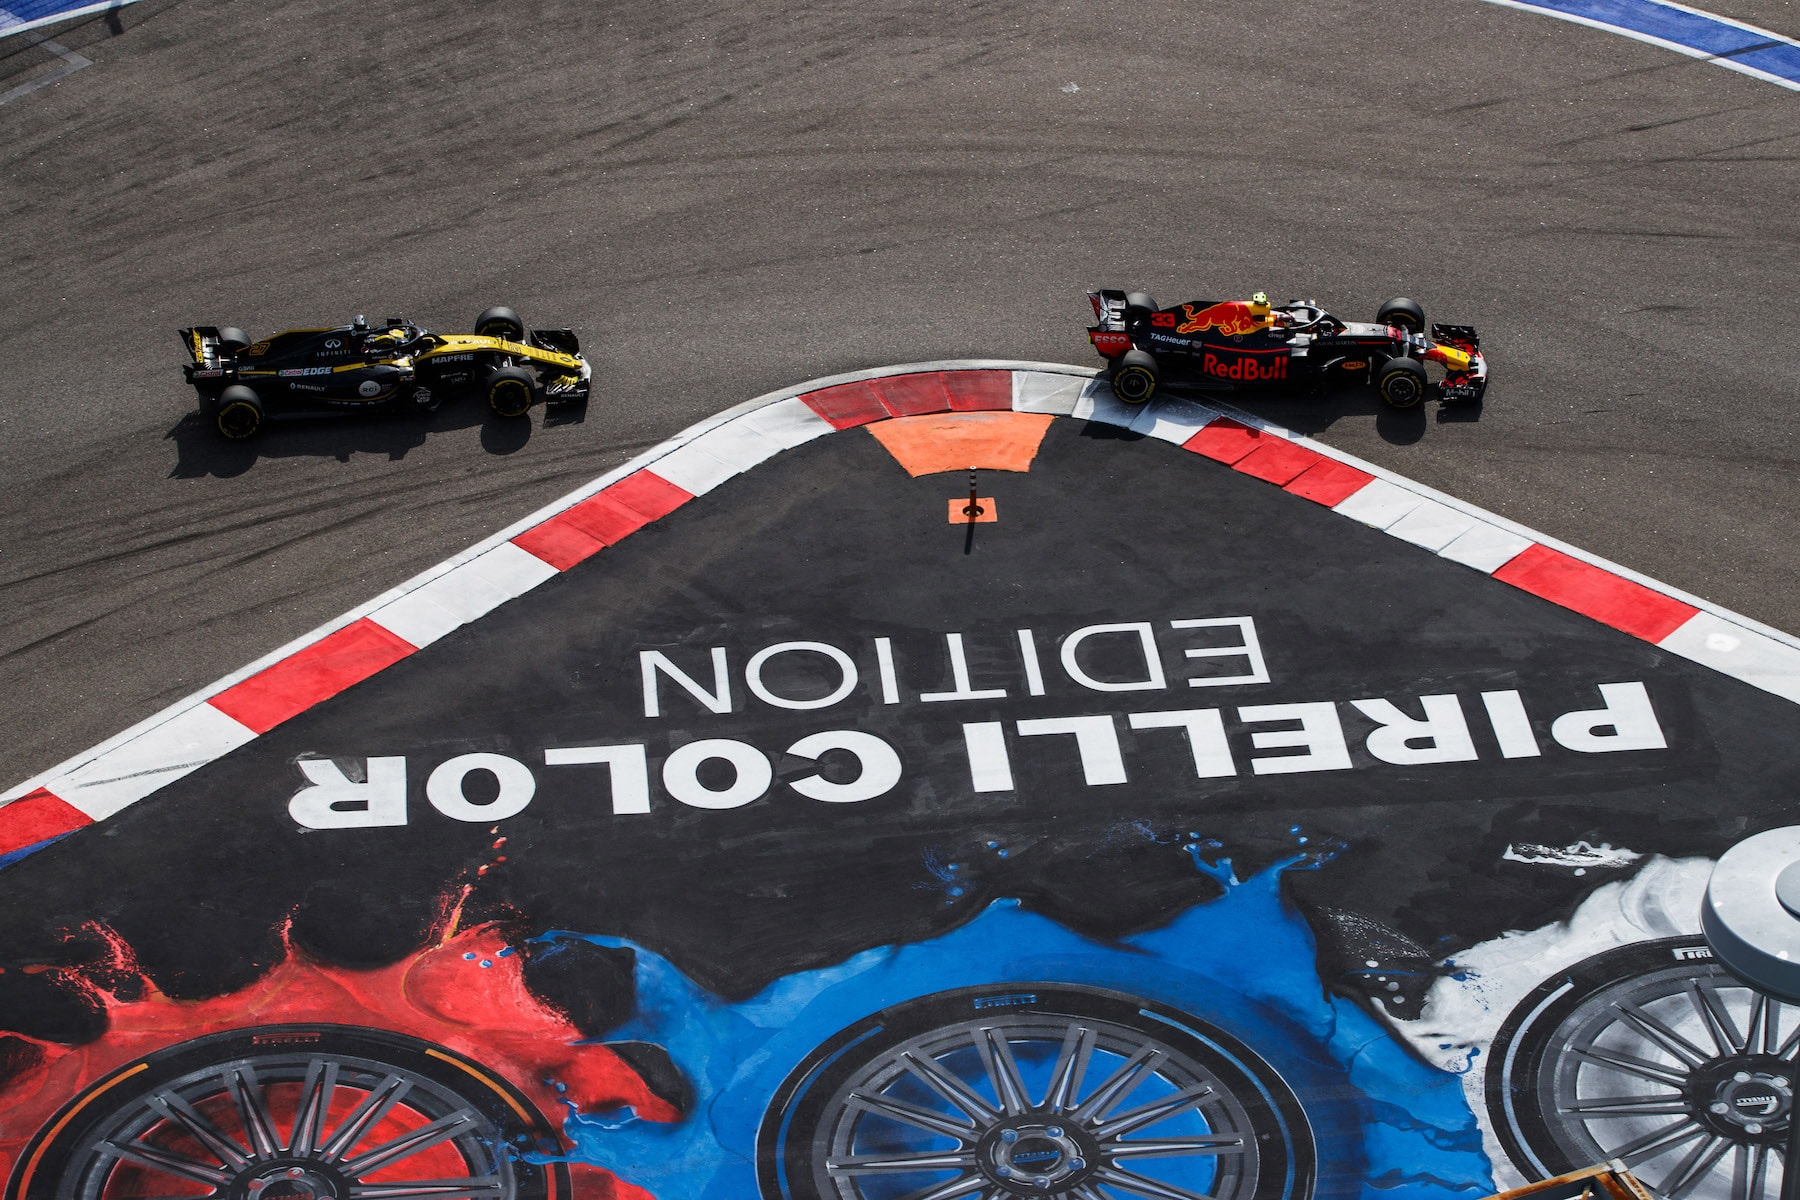 G 2018 Max Verstappen | Red Bull RB14 | 2018 Russian GP 2 copy.jpg